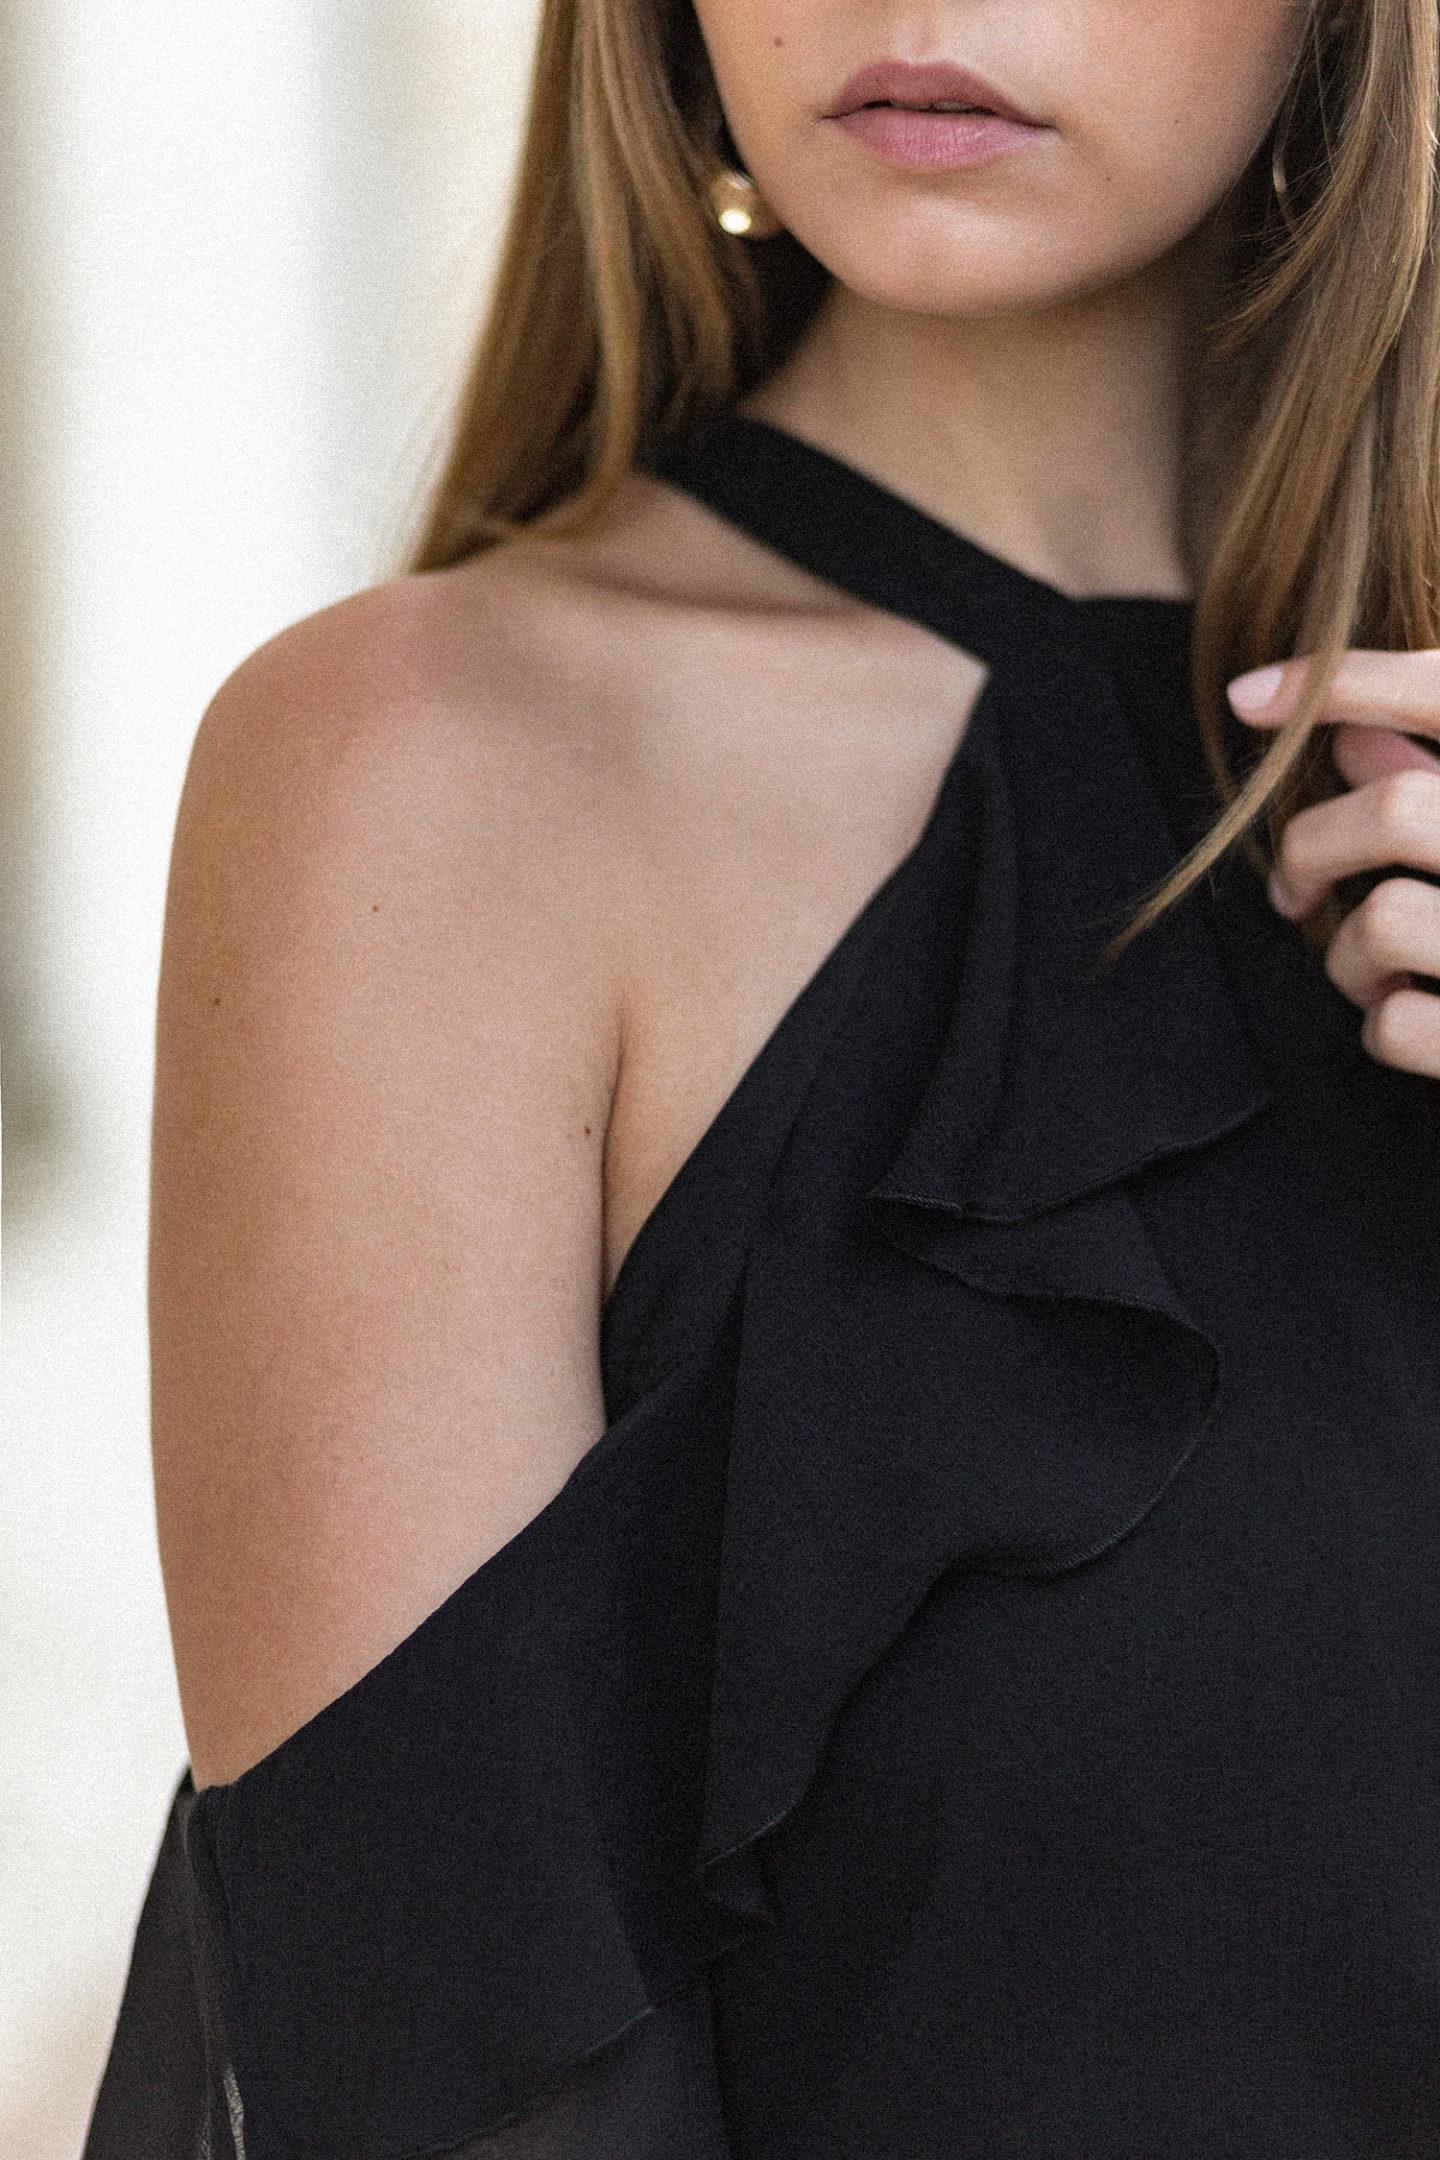 elegantes schwarz wei outfit mit schulterfreier bluse. Black Bedroom Furniture Sets. Home Design Ideas